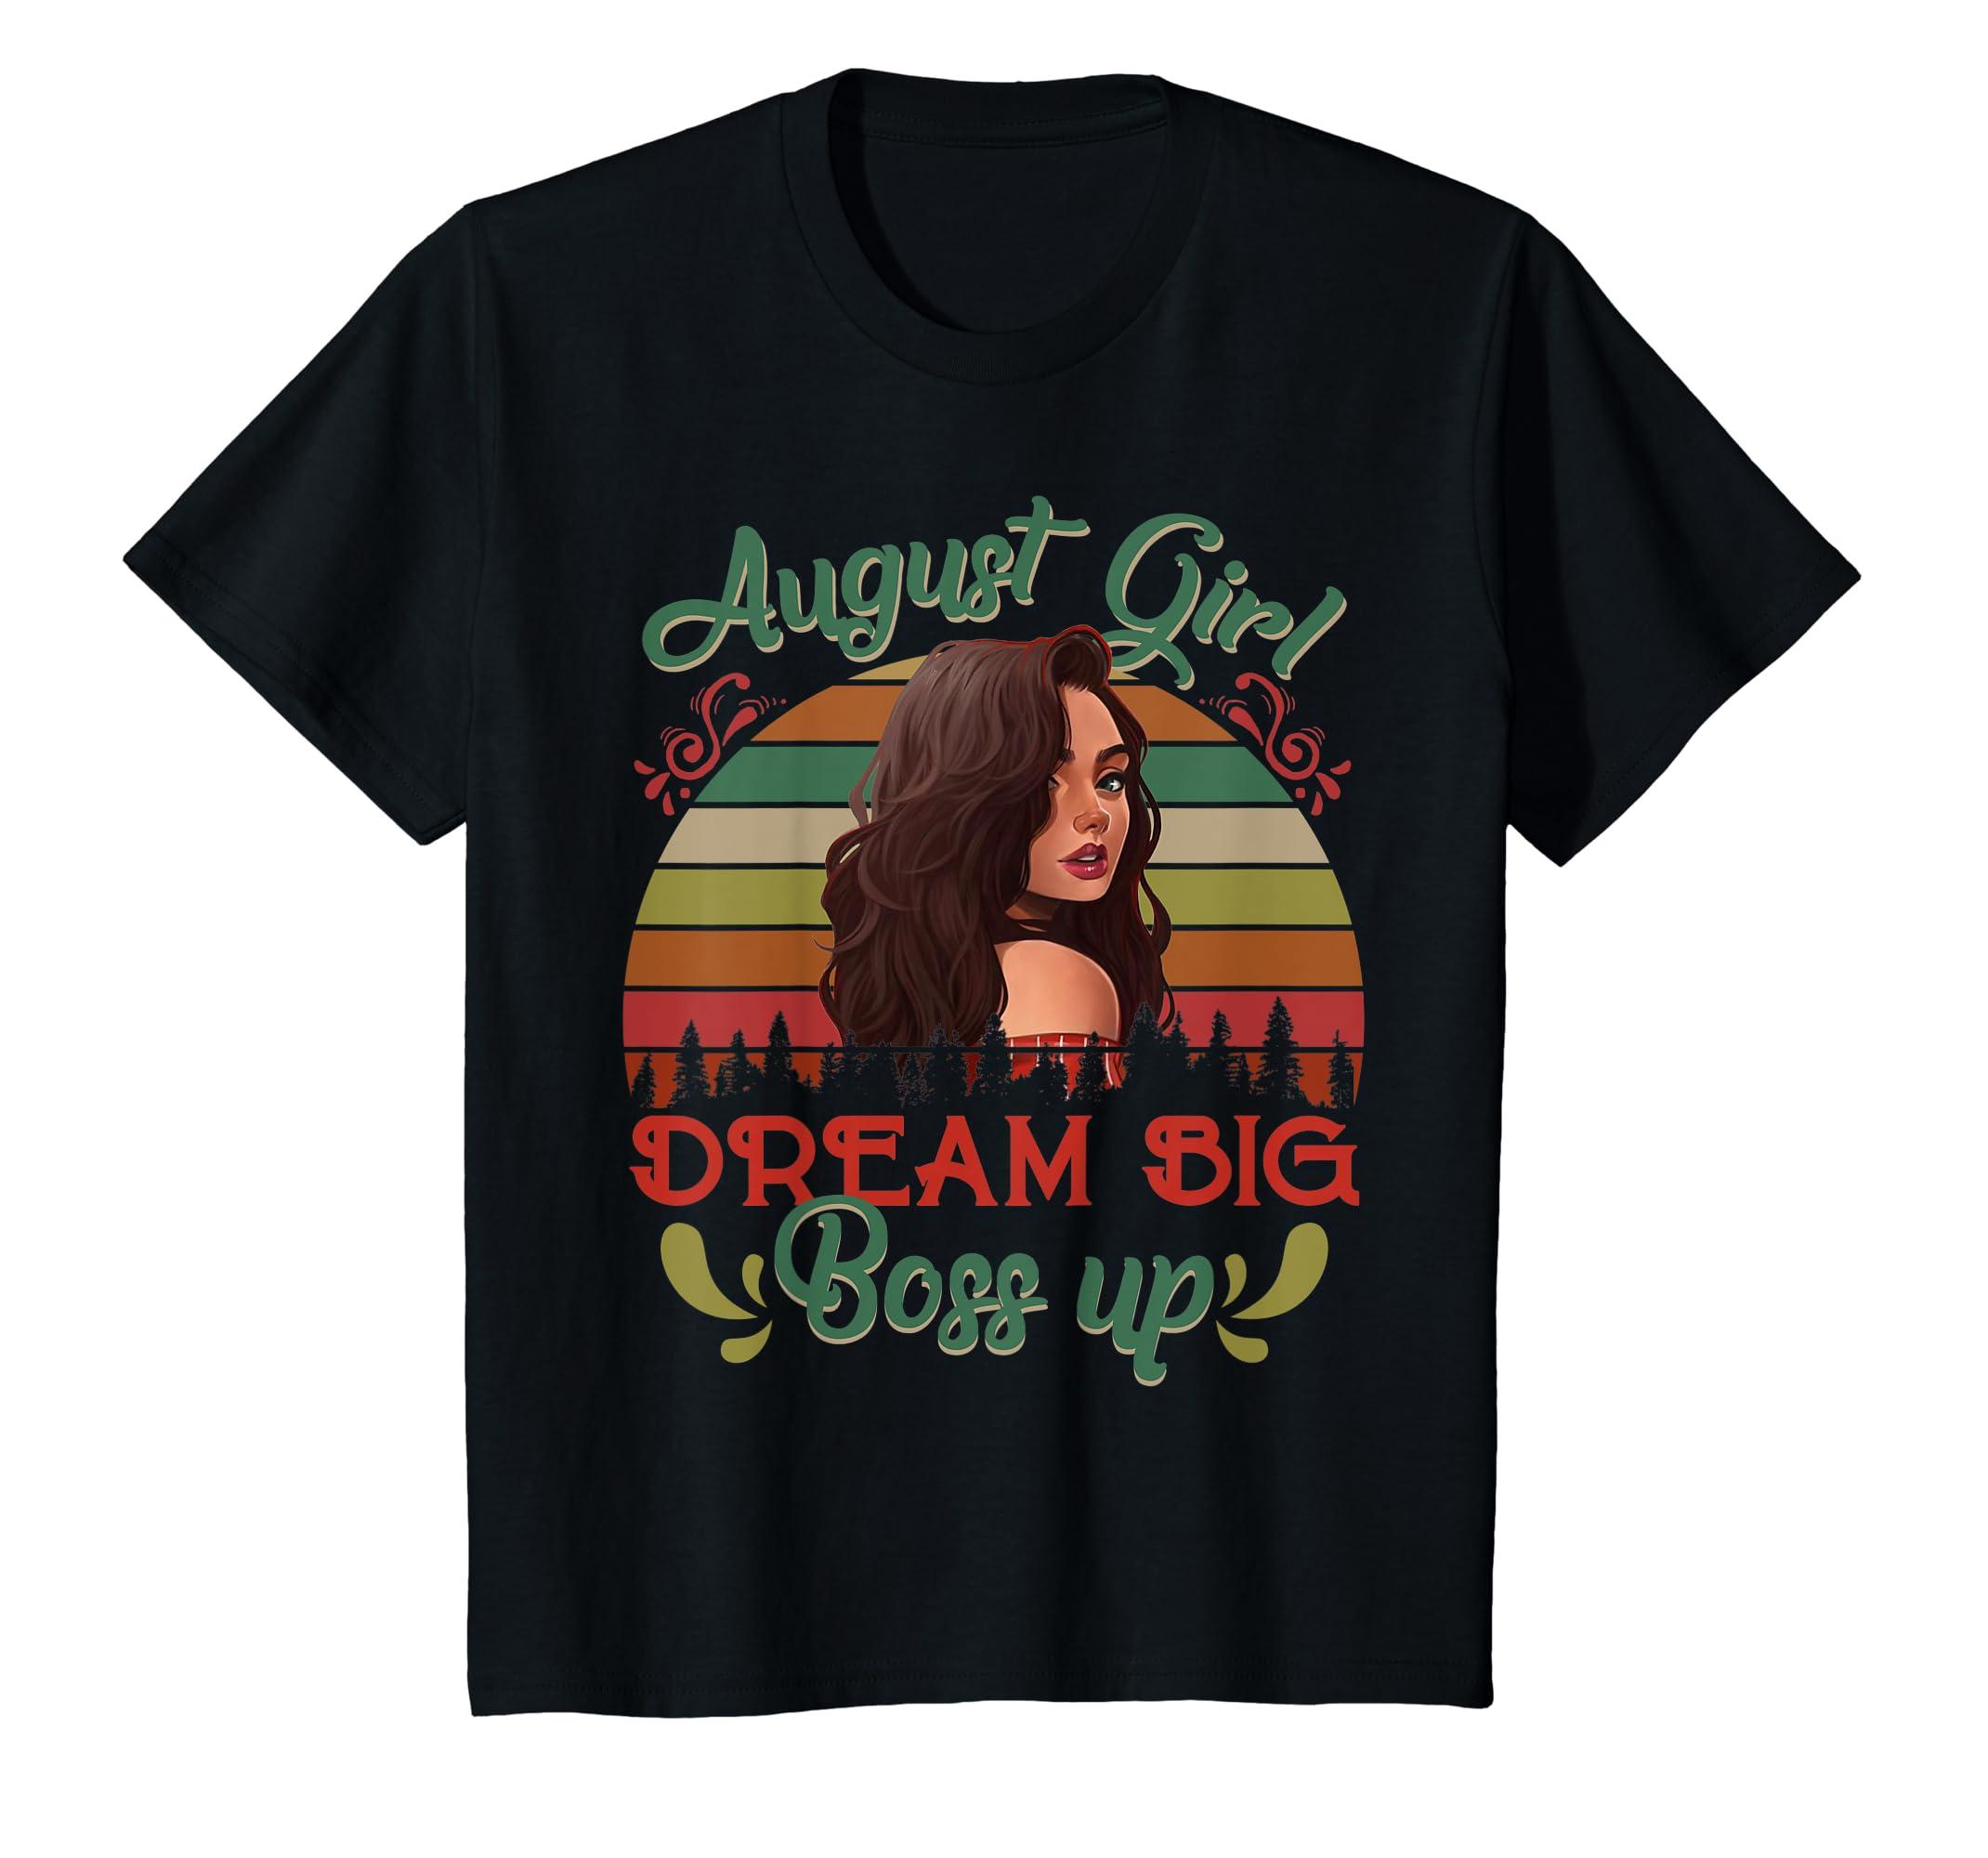 a1ad037f7 Amazon.com: August Girl Dream Big Boss Up T-Shirt Retro Birthday Girl:  Clothing